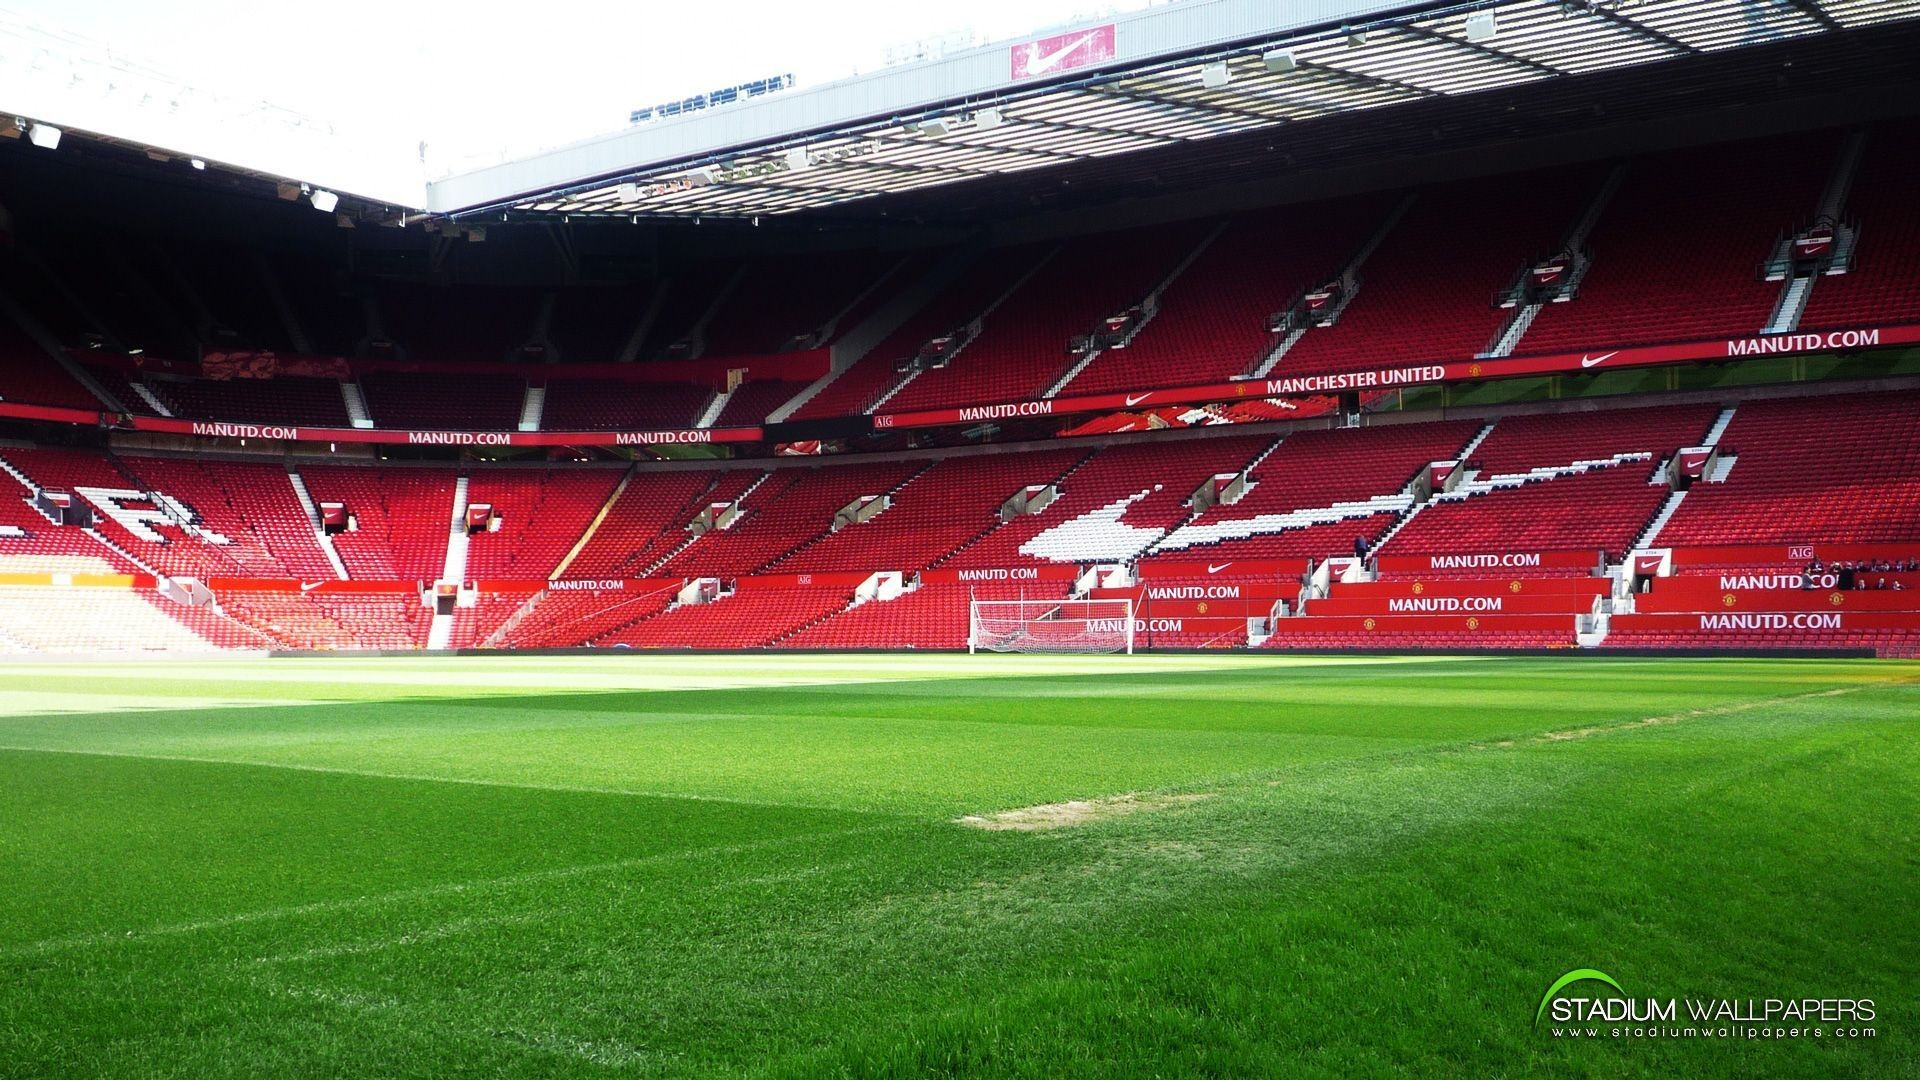 Wallpaper Hd Manchester United wallpaper hd · Football Stadiums